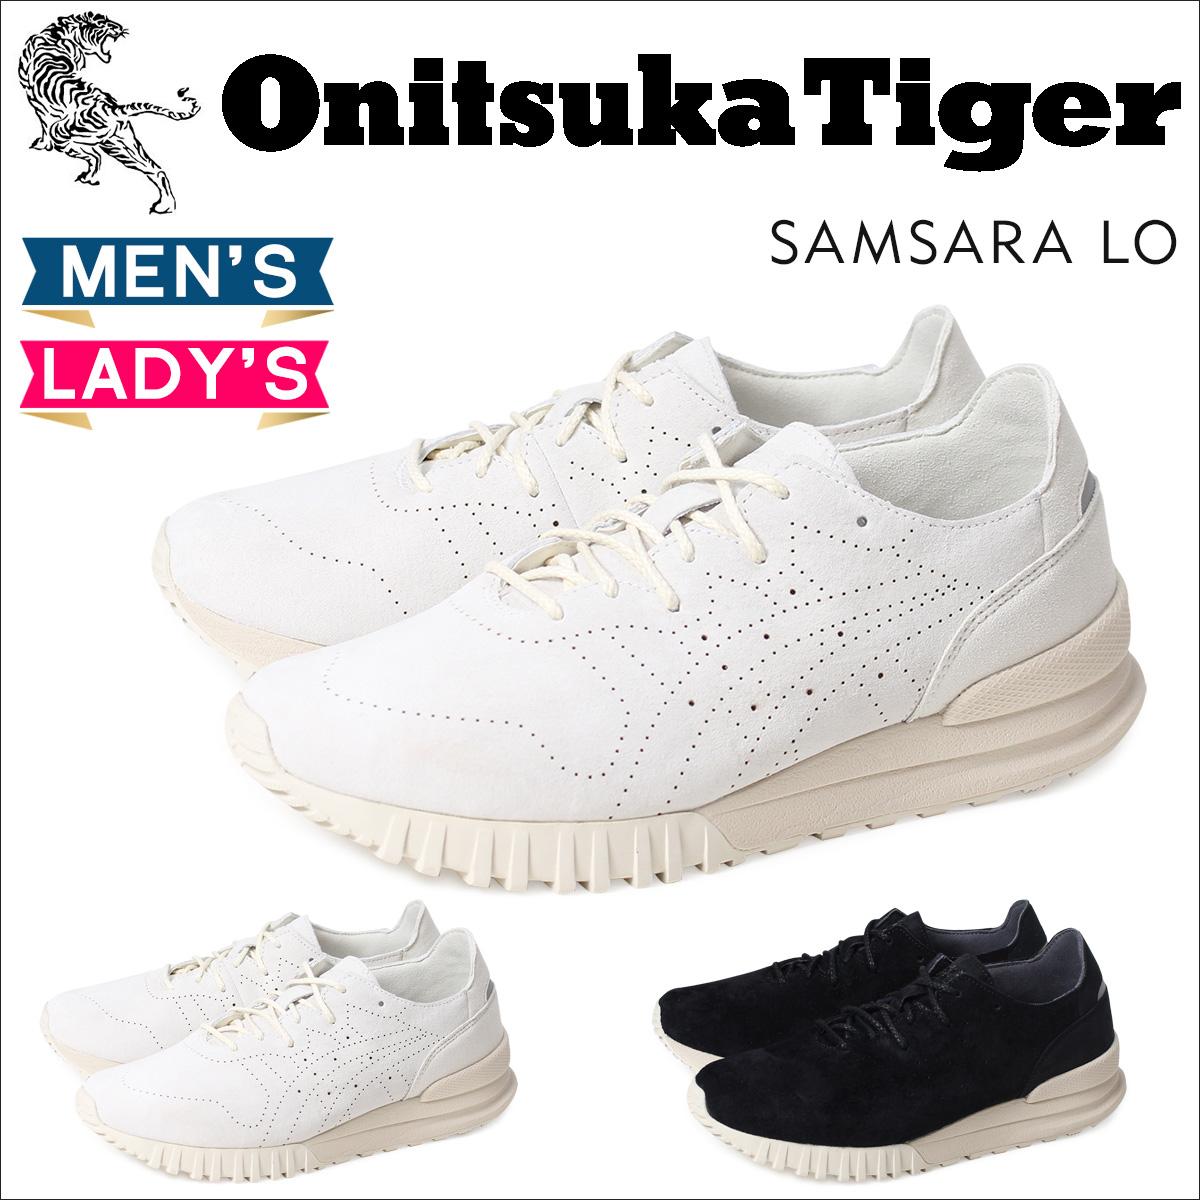 Onitsuka tiger Sam Sarah Onitsuka Tiger SAMSARA LO men gap Dis sneakers TH714L 0000 9090 shoes [2/24 Shinnyu load]